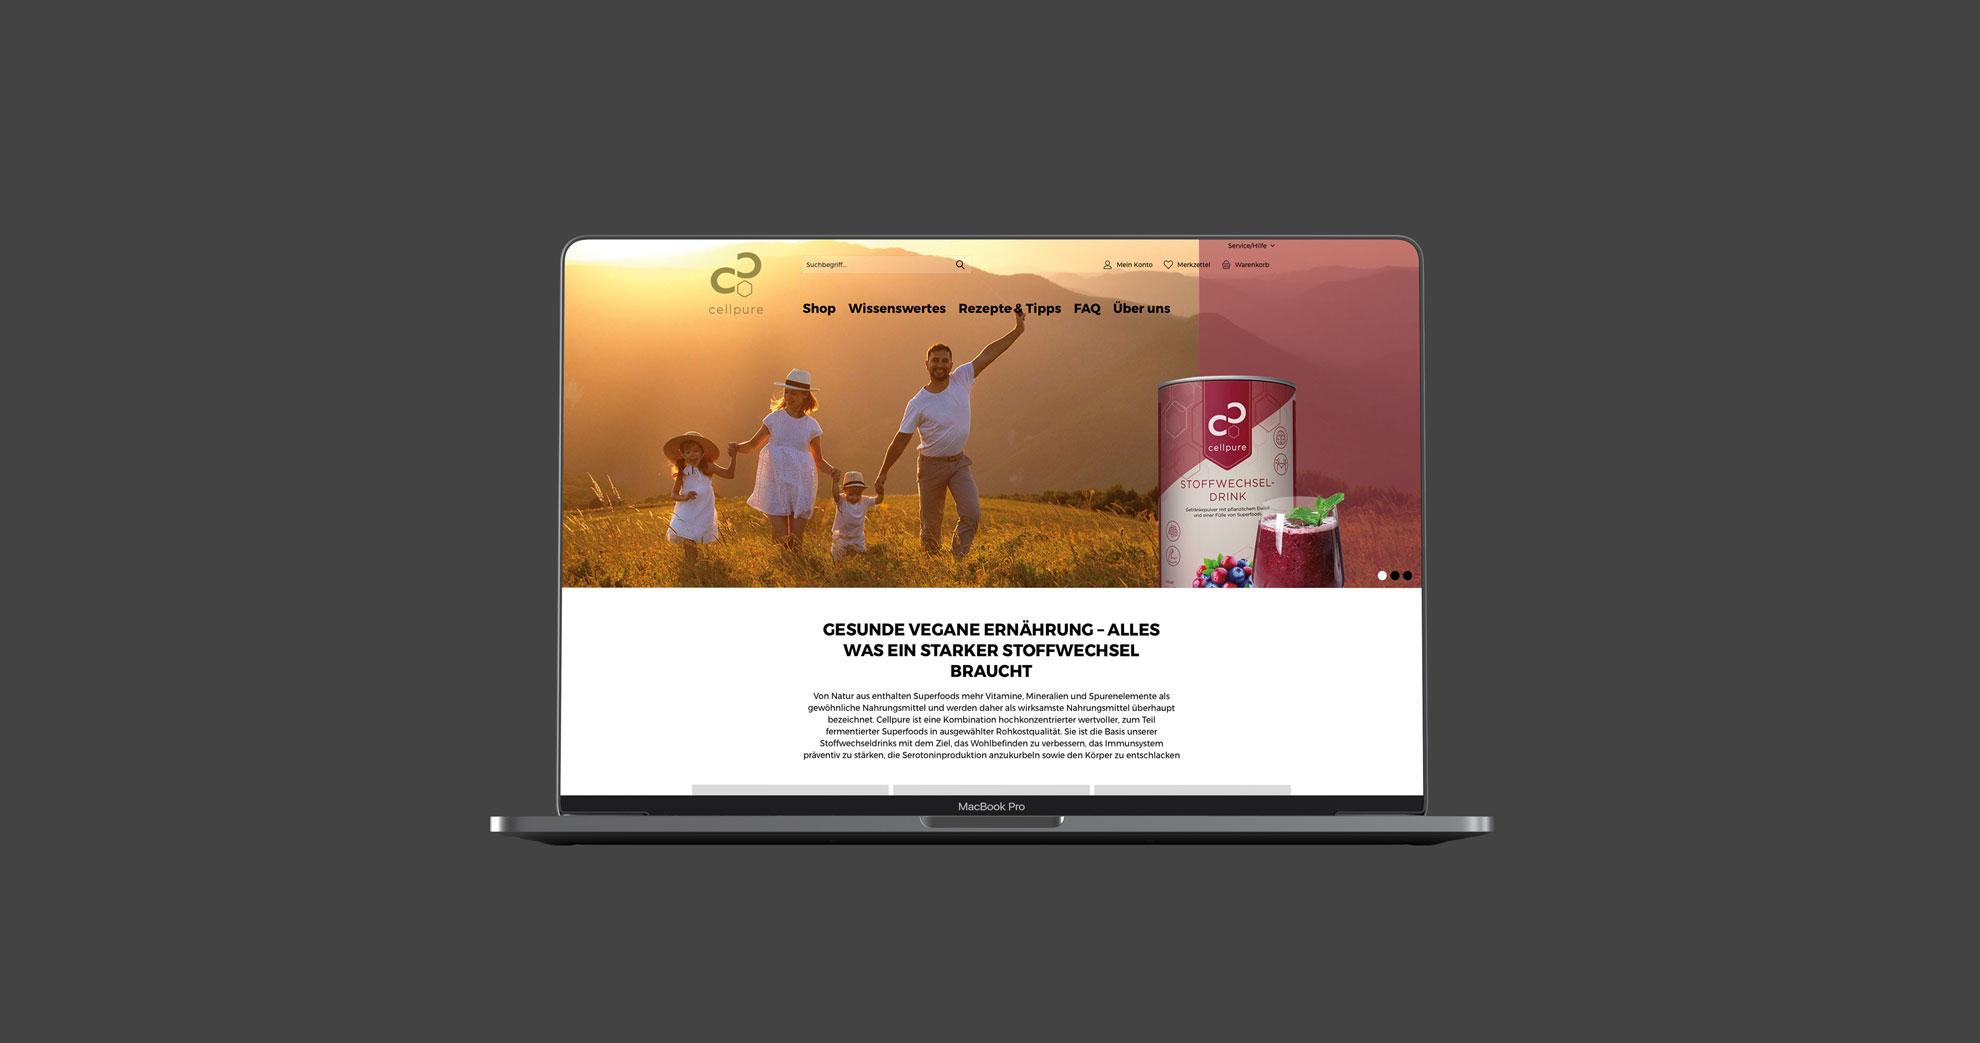 cellpure-eschlikon-brandingagentur-webdeisgn-onlineshop-gasser-miesch-stgallen